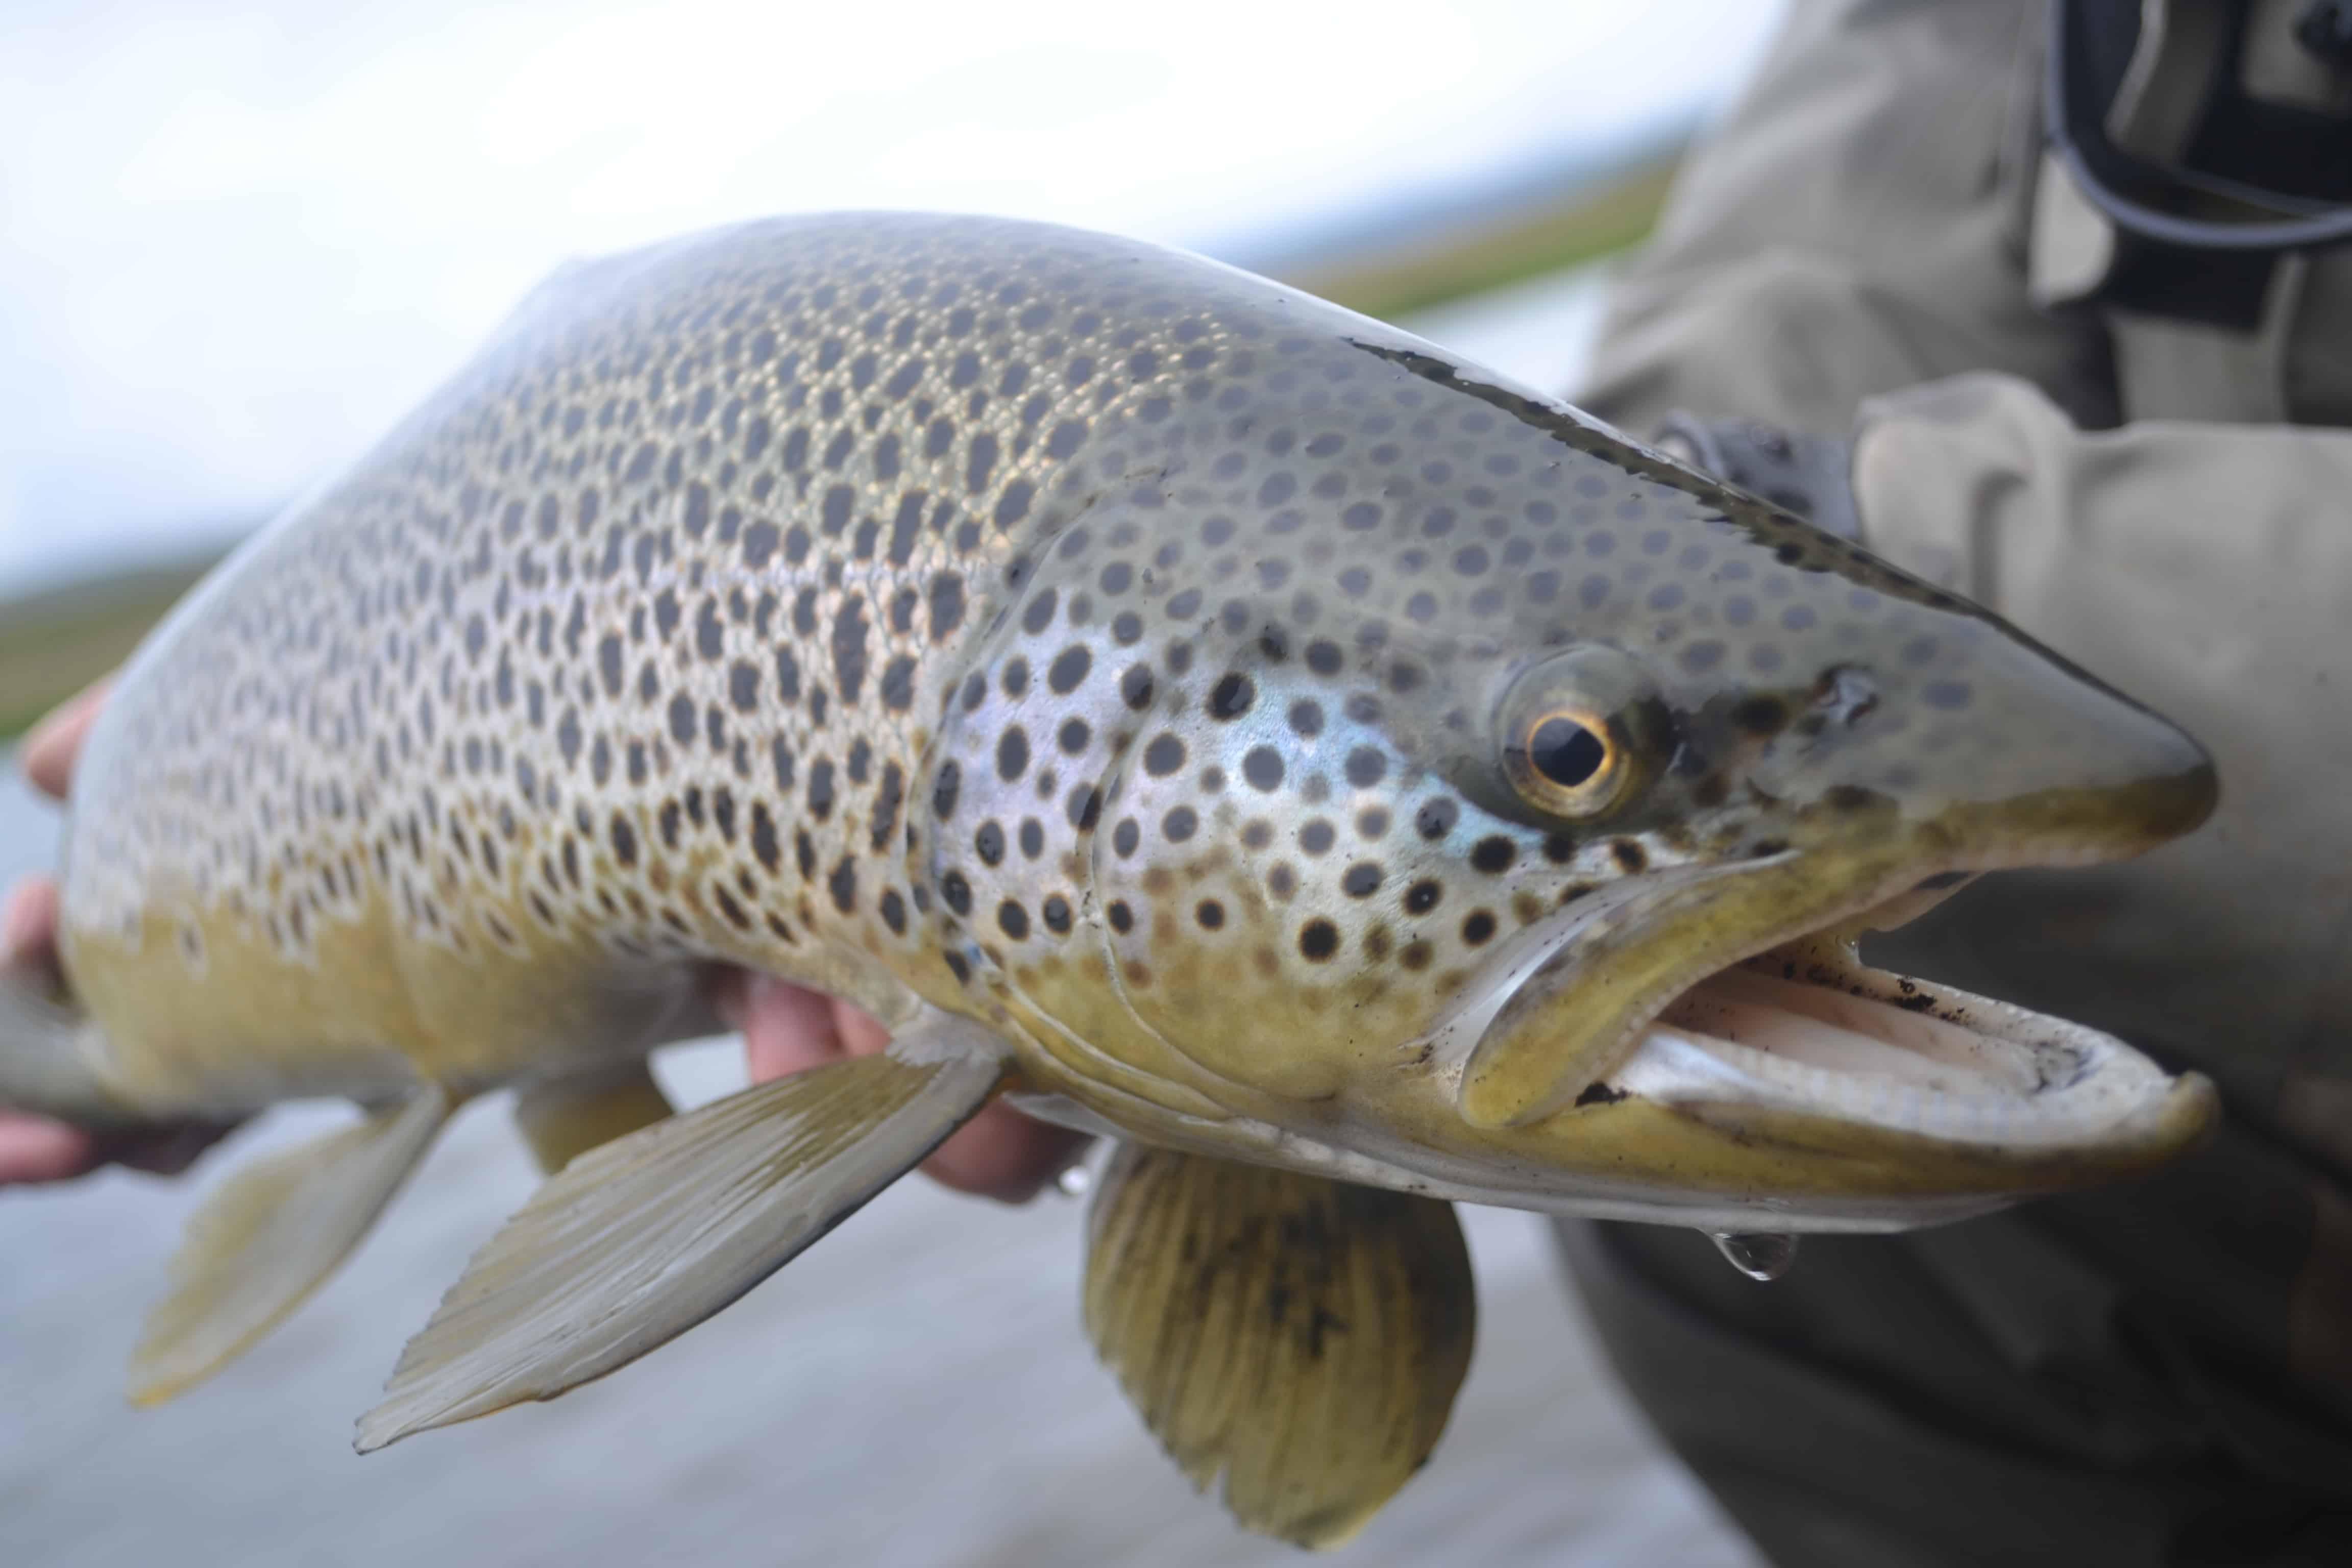 The Big Laxa Native Brown Trout Kristjan Rafnsson Fish Partner The DrakeCast